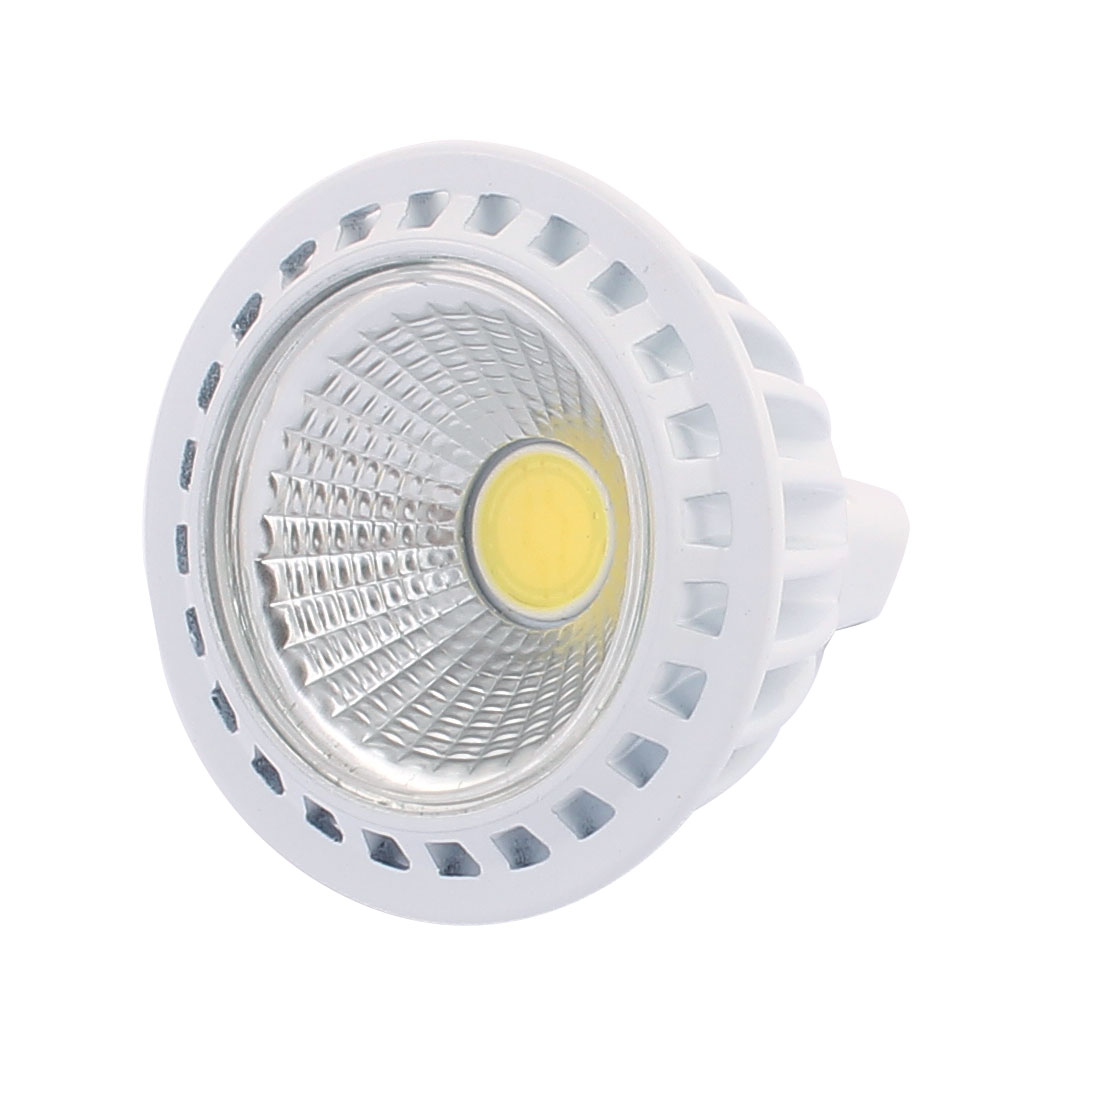 DC12V 3W Ultra Bright MR16 COB LED Spotlight Lamp Bulb Downlight Pure White